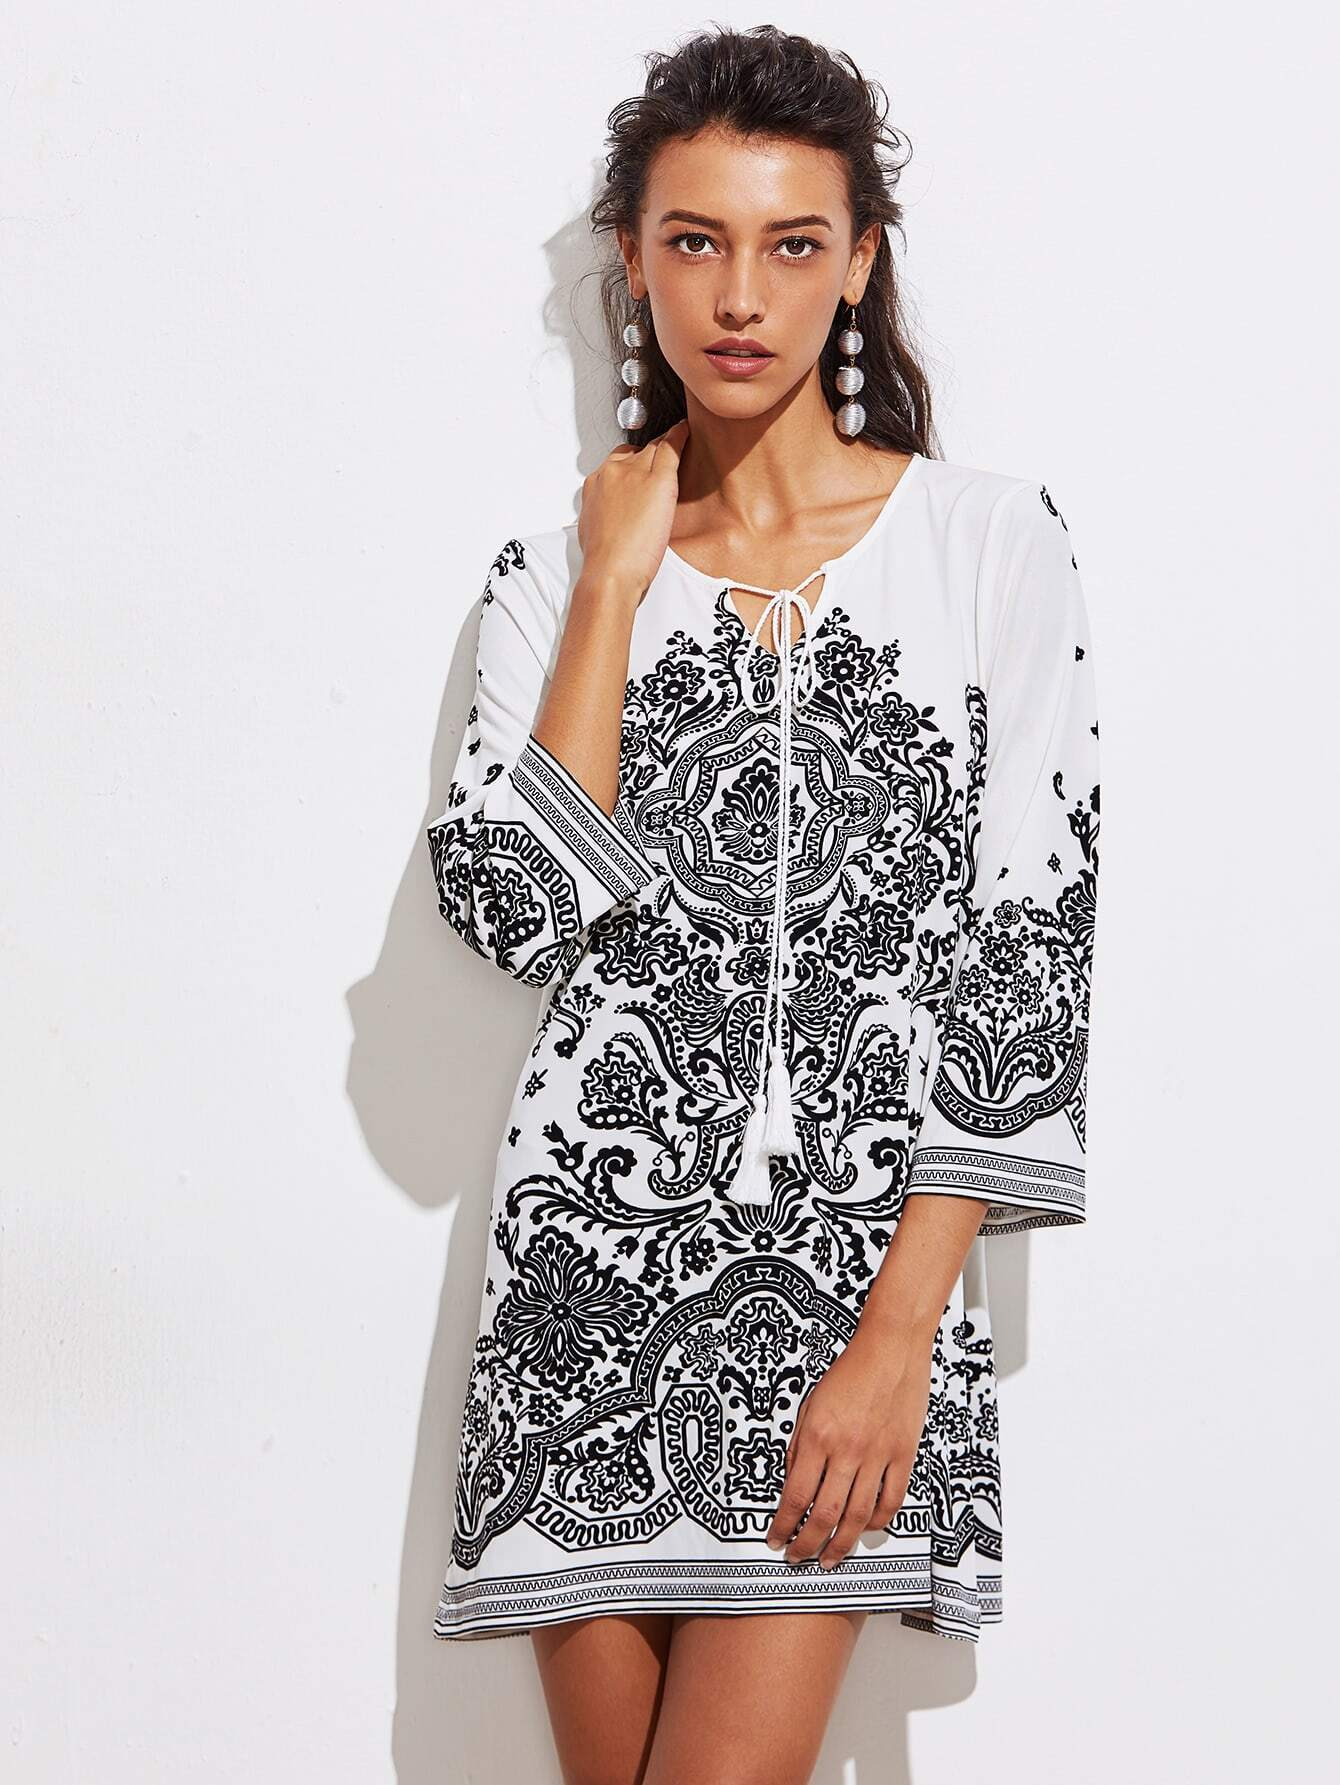 Tasseled Tie Neck Vine Print Dress dress170918459